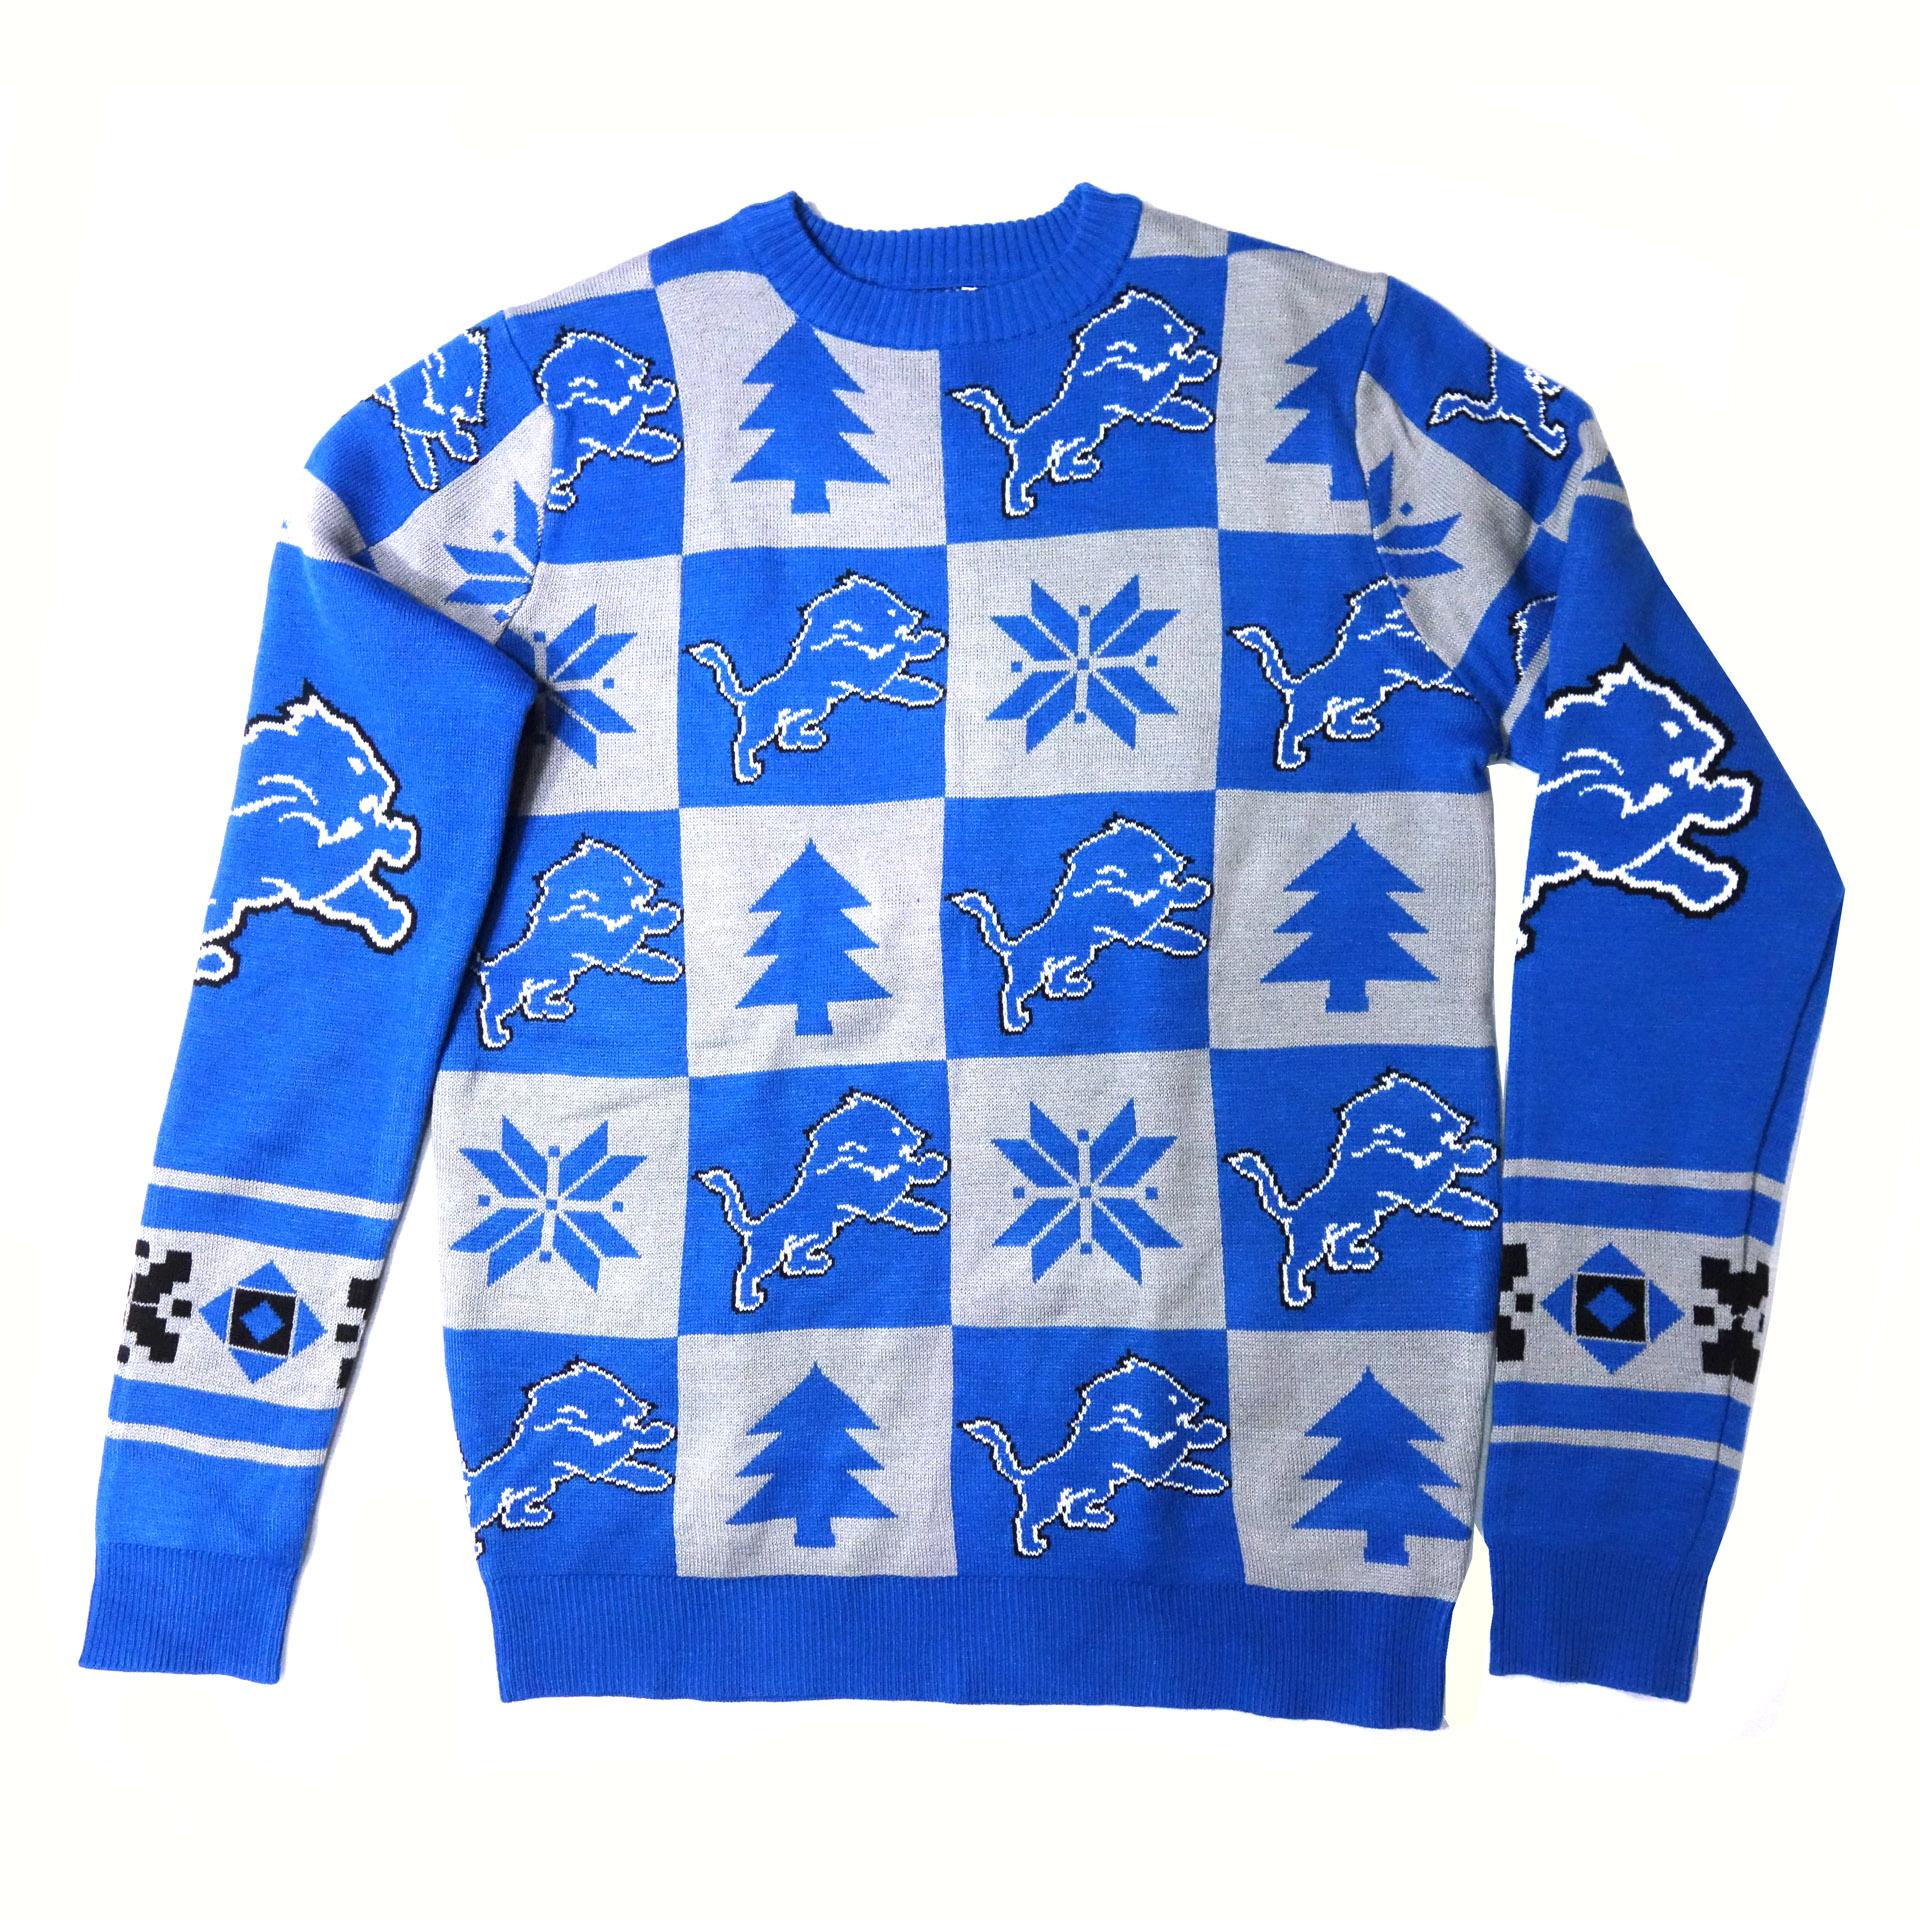 NFL Ugly Sweater Detroit Lions Schachbrettmuster Weihnachtspullover